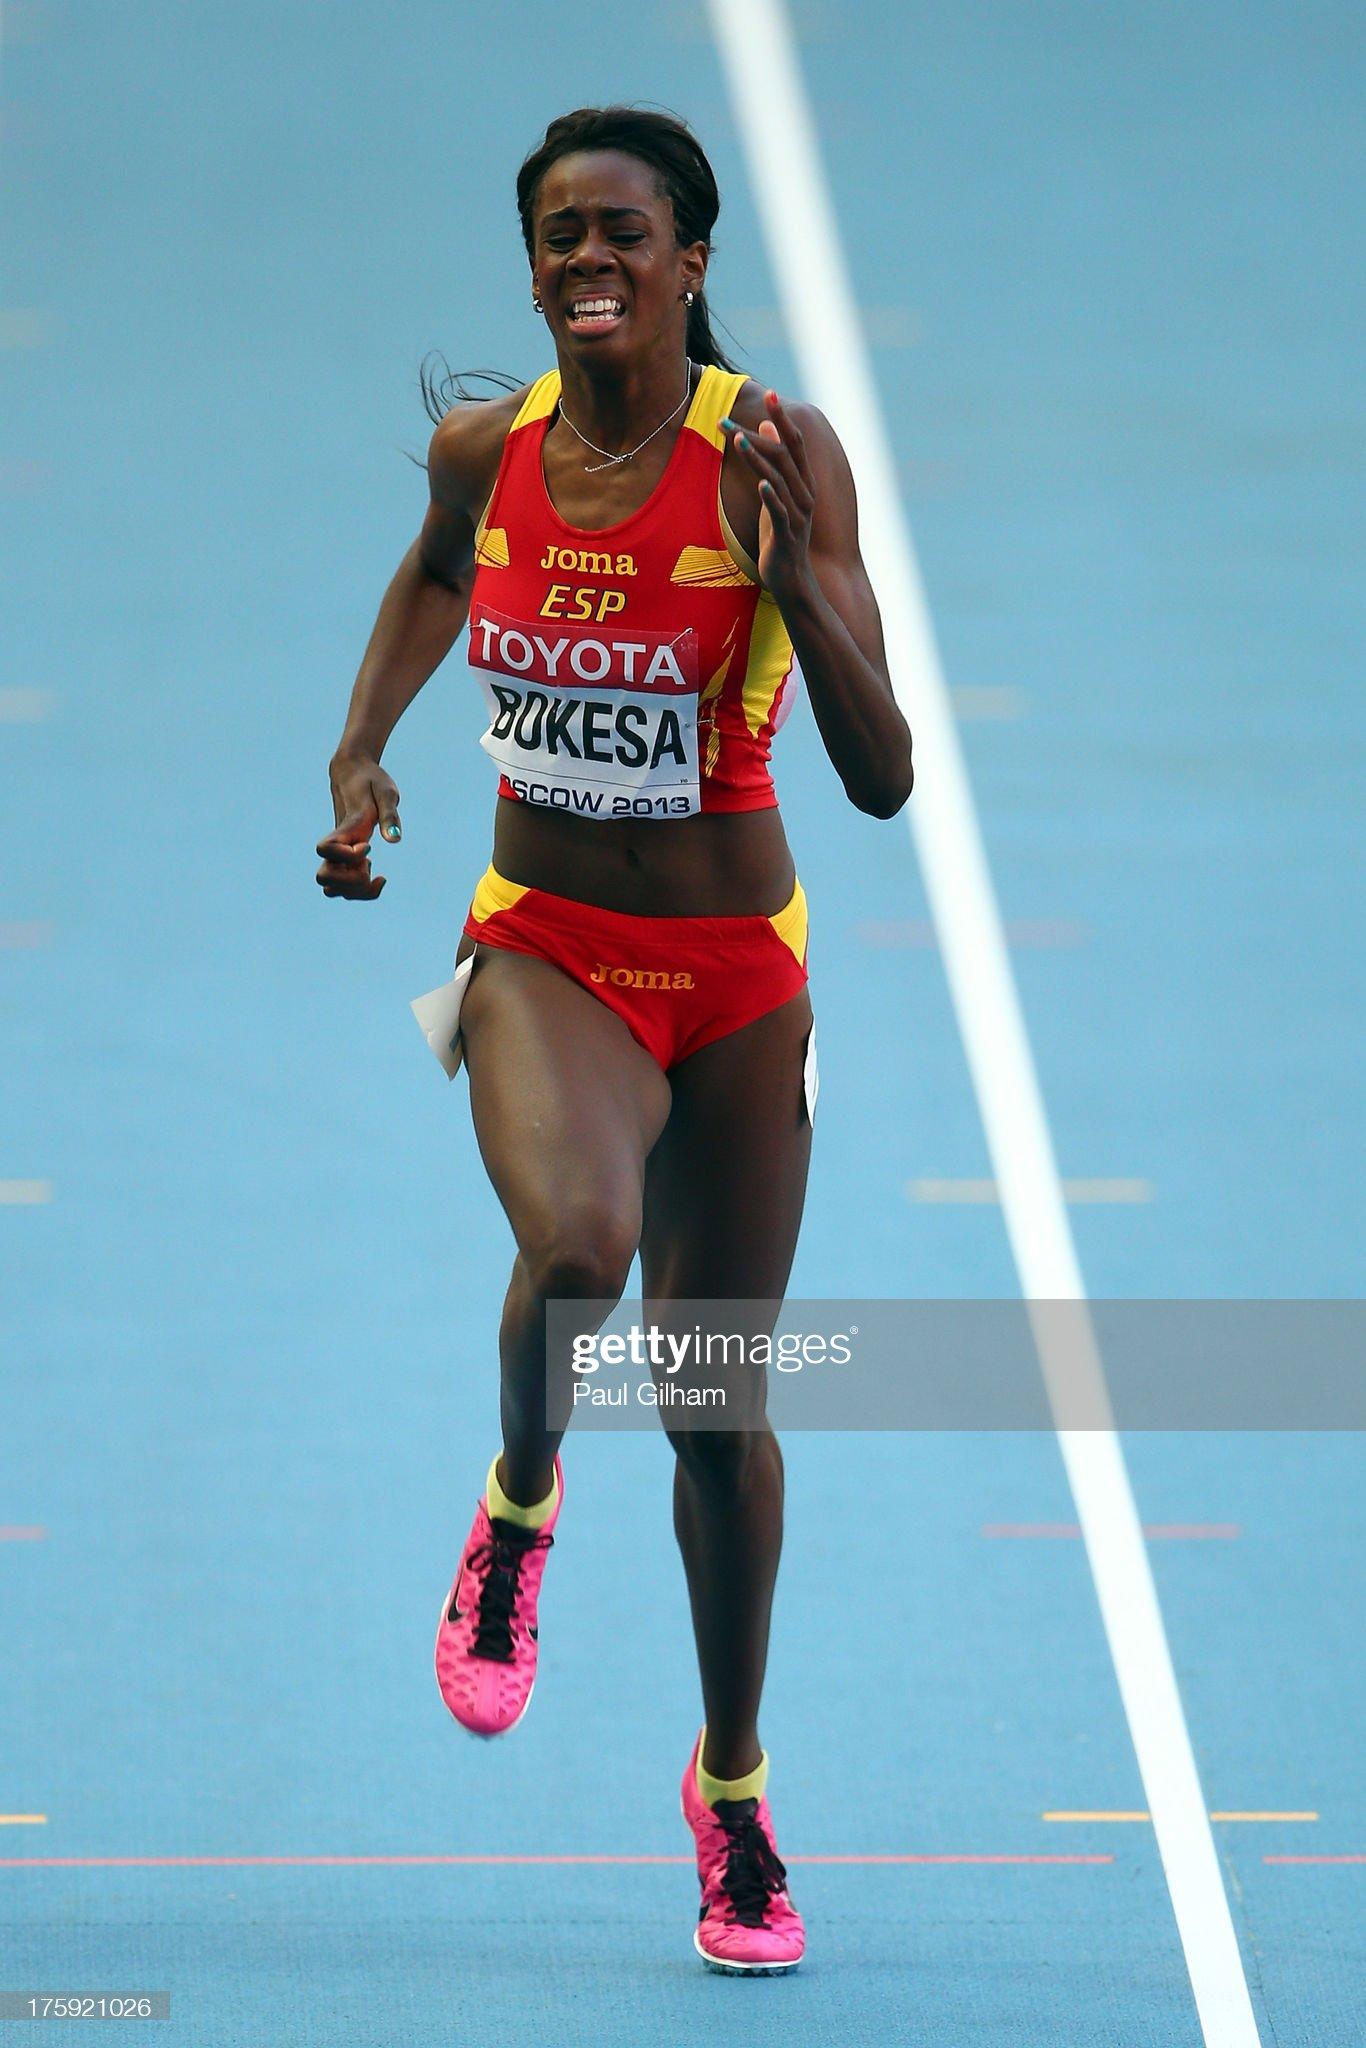 ¿Cuánto mide Aauri Lorena Bokesa? - Altura - Real height Aauri-lorena-bokesa-of-spain-competes-in-the-womens-400-metres-heats-picture-id175921026?s=2048x2048